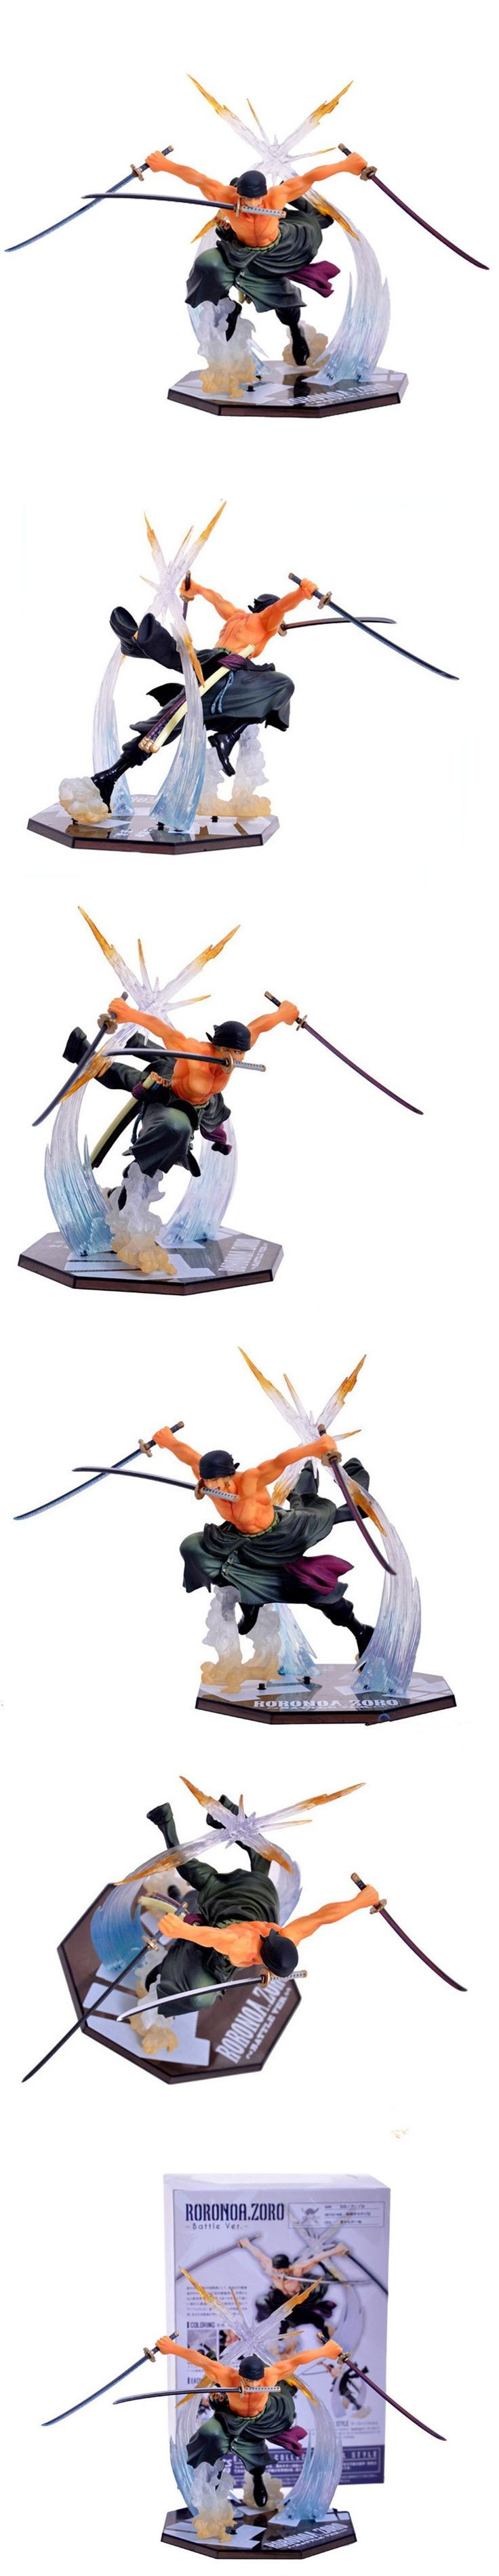 Anime One Piece Figurine Zoro 21cm Fighting Roronoa Zoro Swords Action Figure Model Toys Dolls Cool Kids Gift Home Decor $20.81